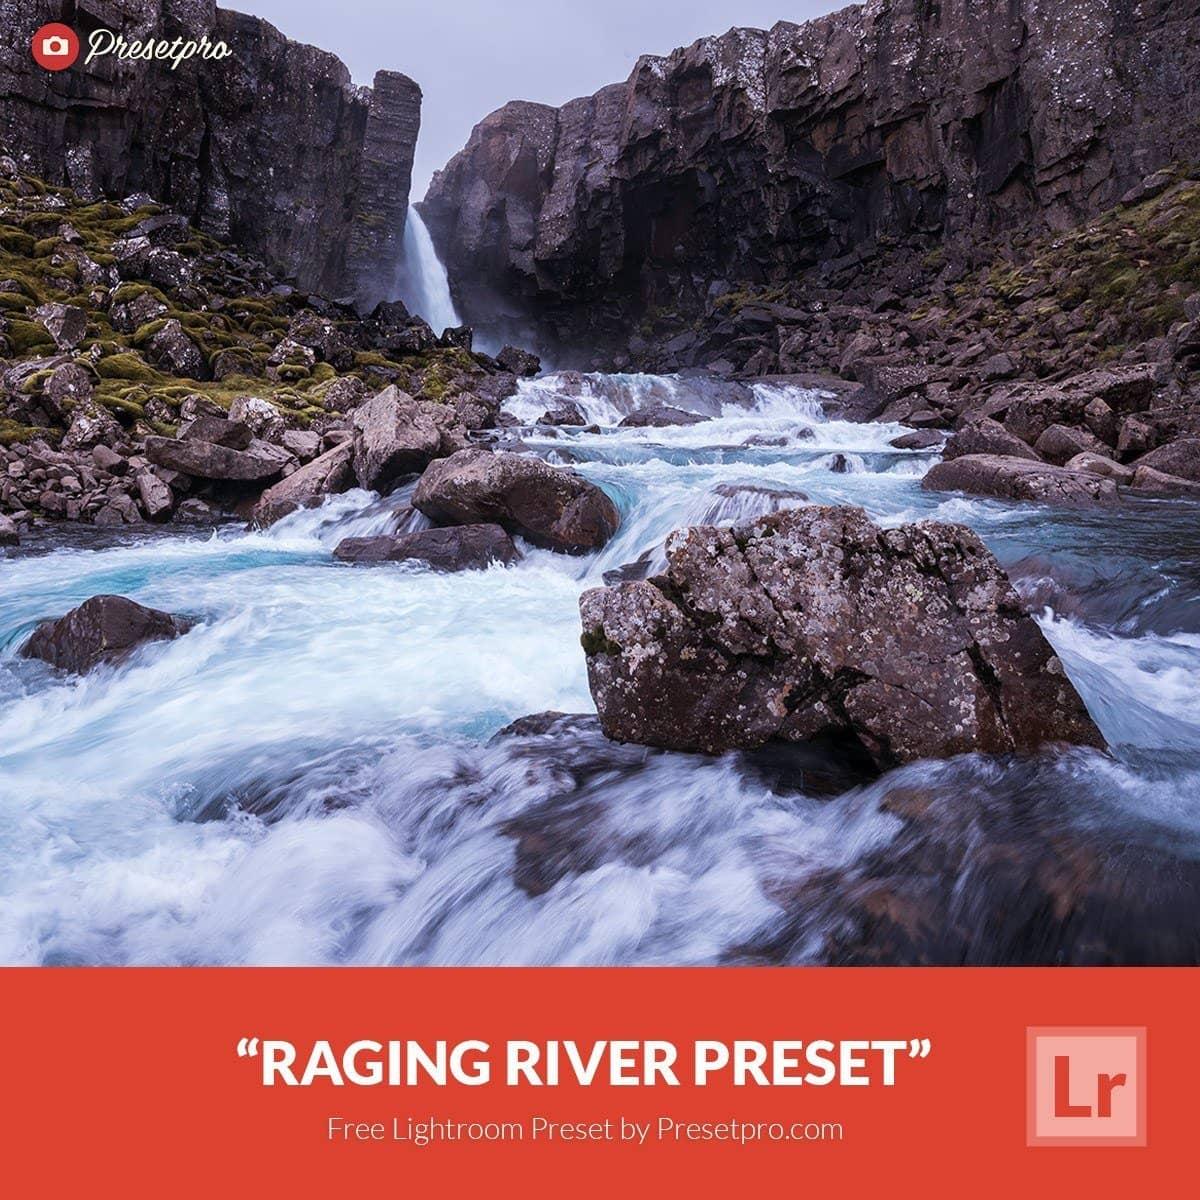 Free-Lightroom-Preset-Raging-River-Presetpro.com_